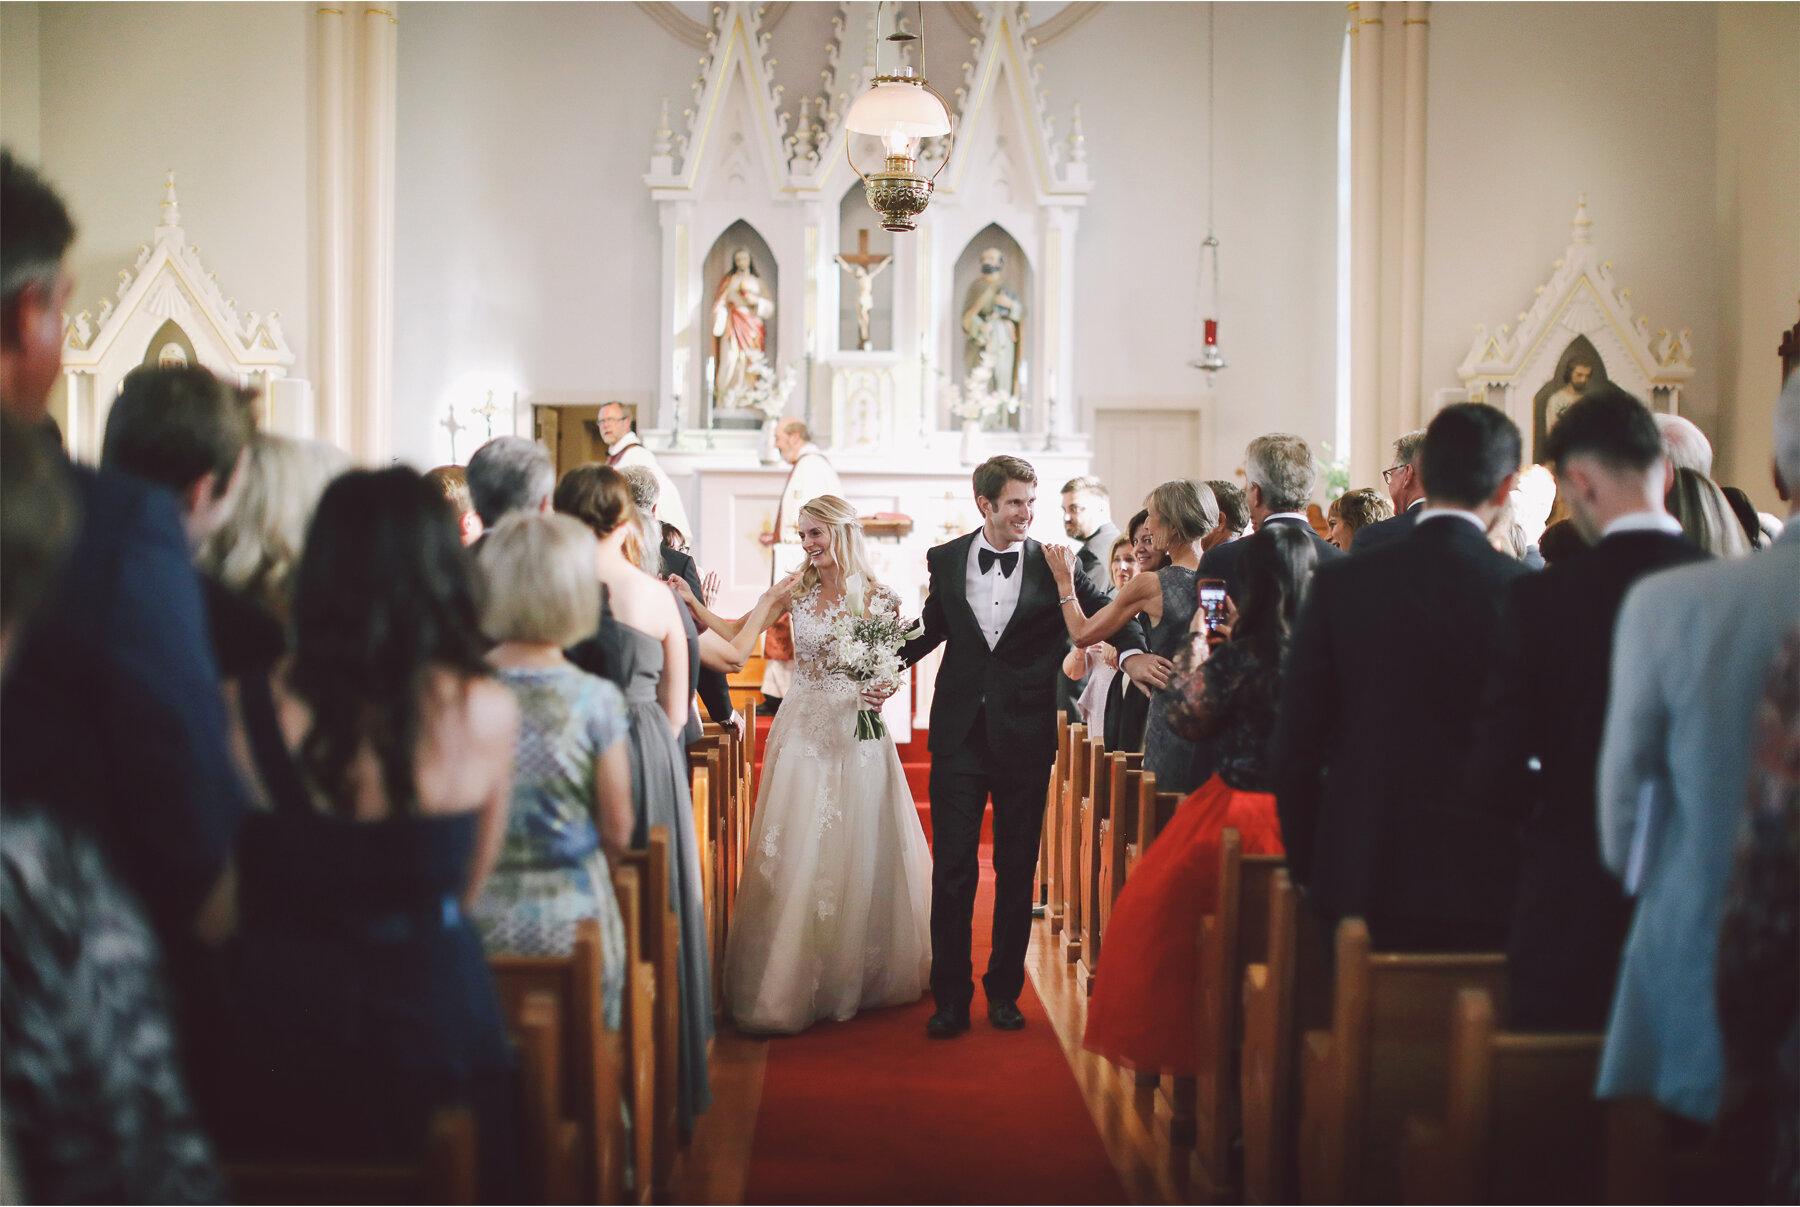 14 Wedding Vick Photography Minneapolis Minnesota Ceremony St Peters Mendota Michelle and William.jpg